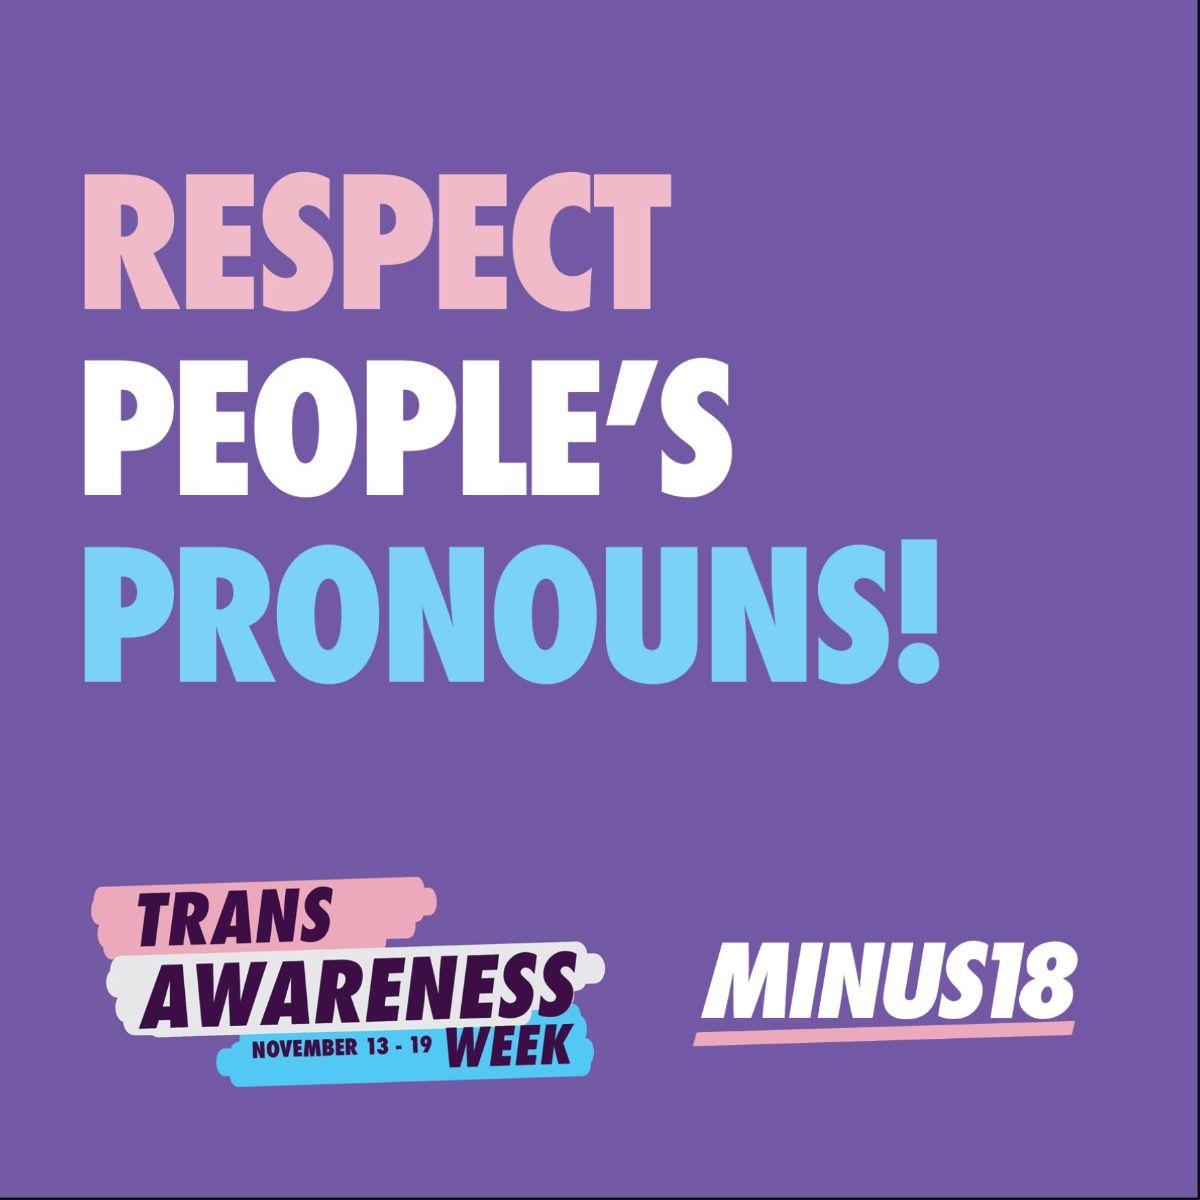 Respect people''s pronouns